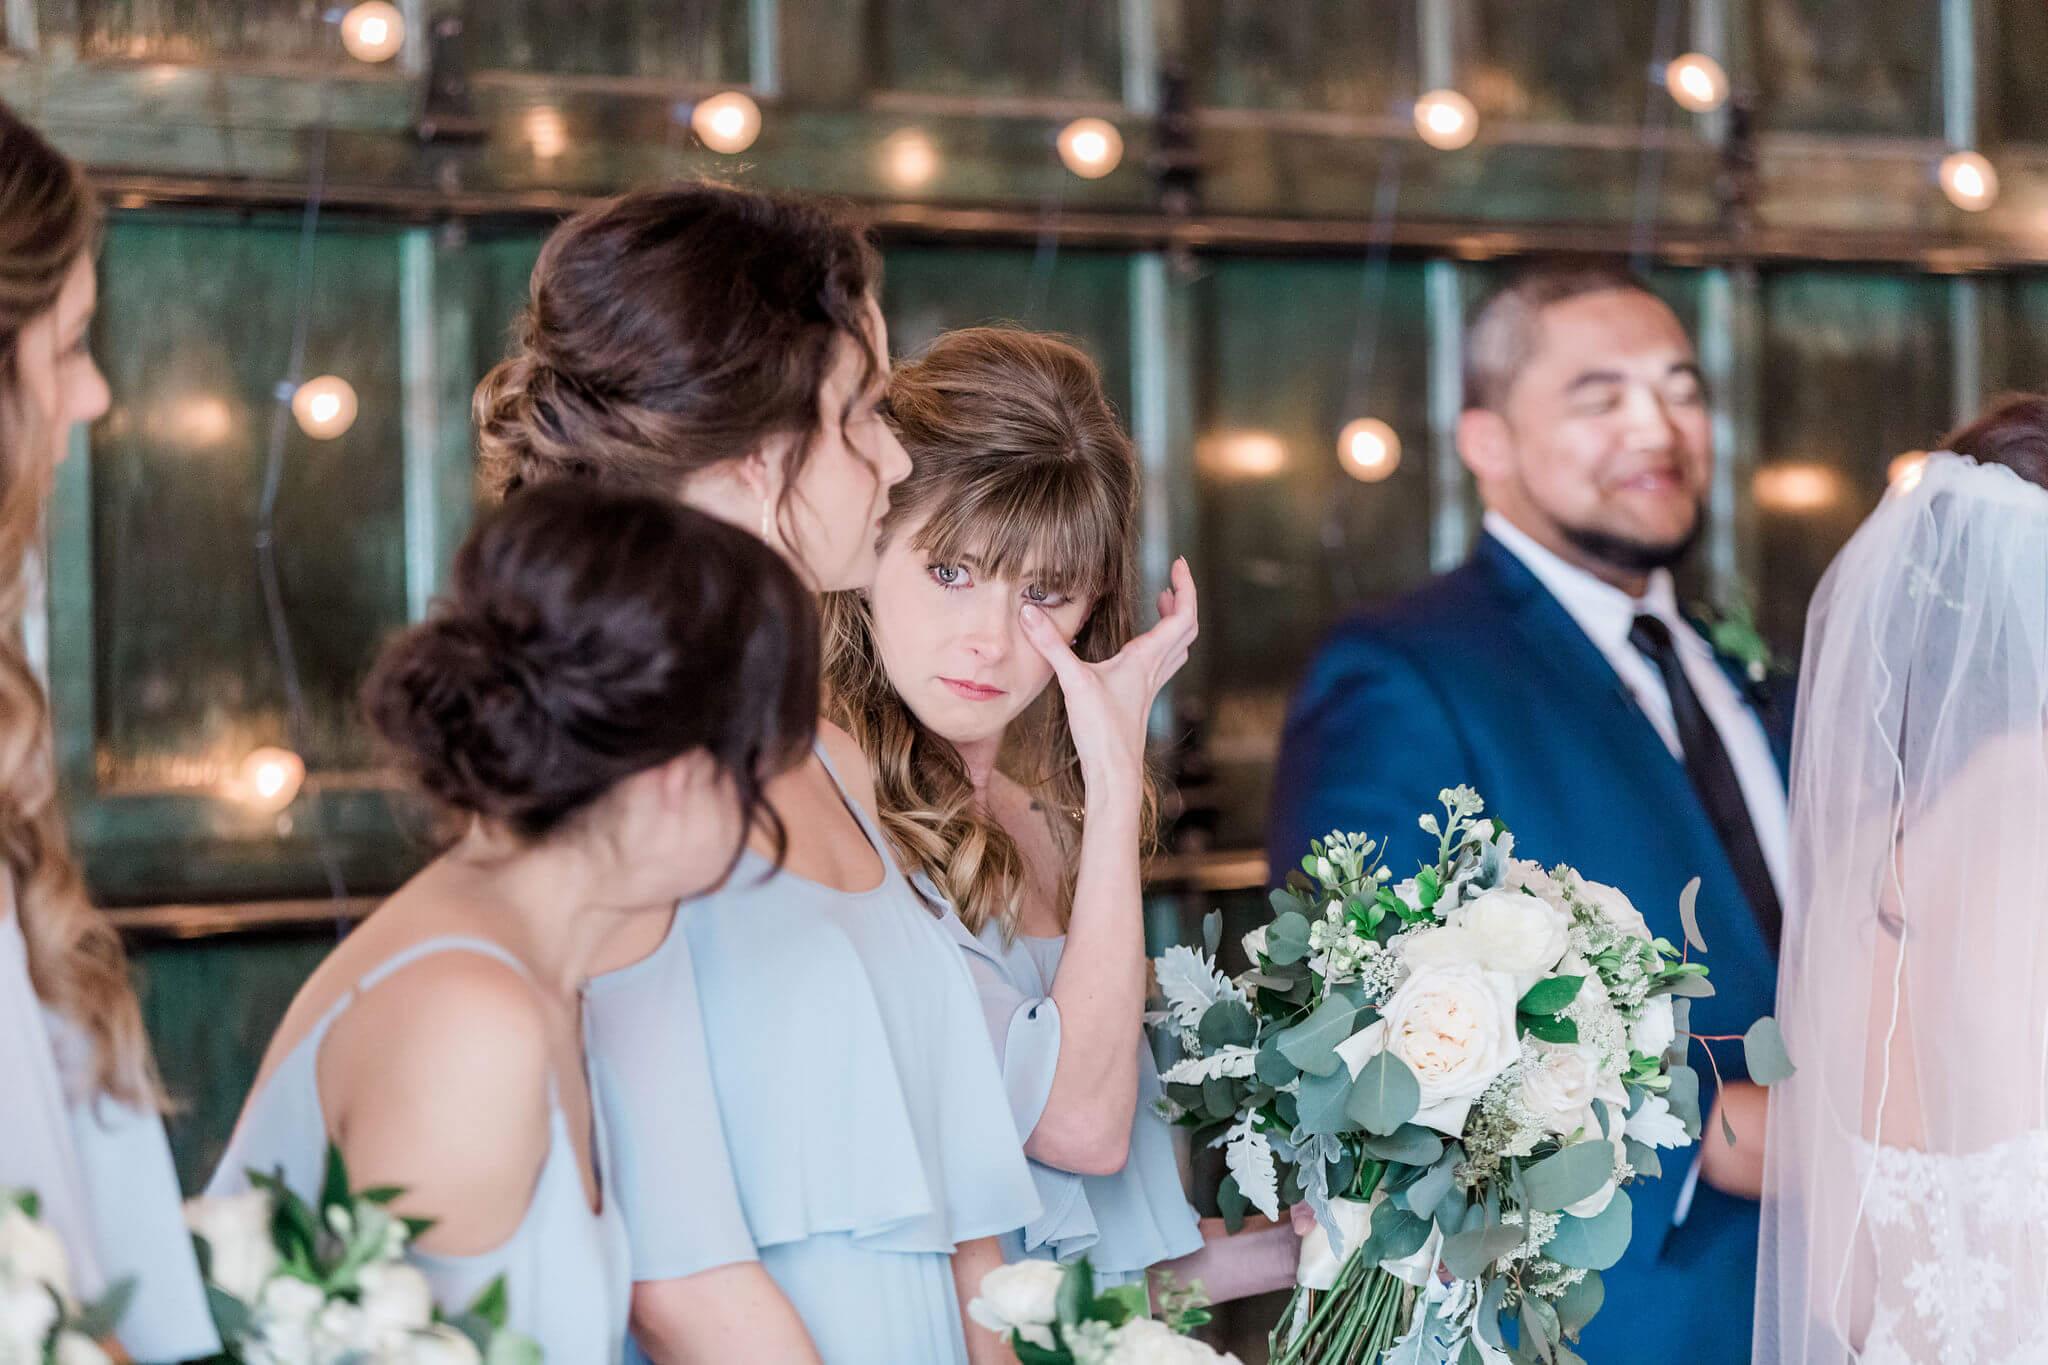 Apt-b-photography-savannah-wedding-photographer-savannah-wedding-soho-south-cafe-intimate-wedding-photographer-57.JPG